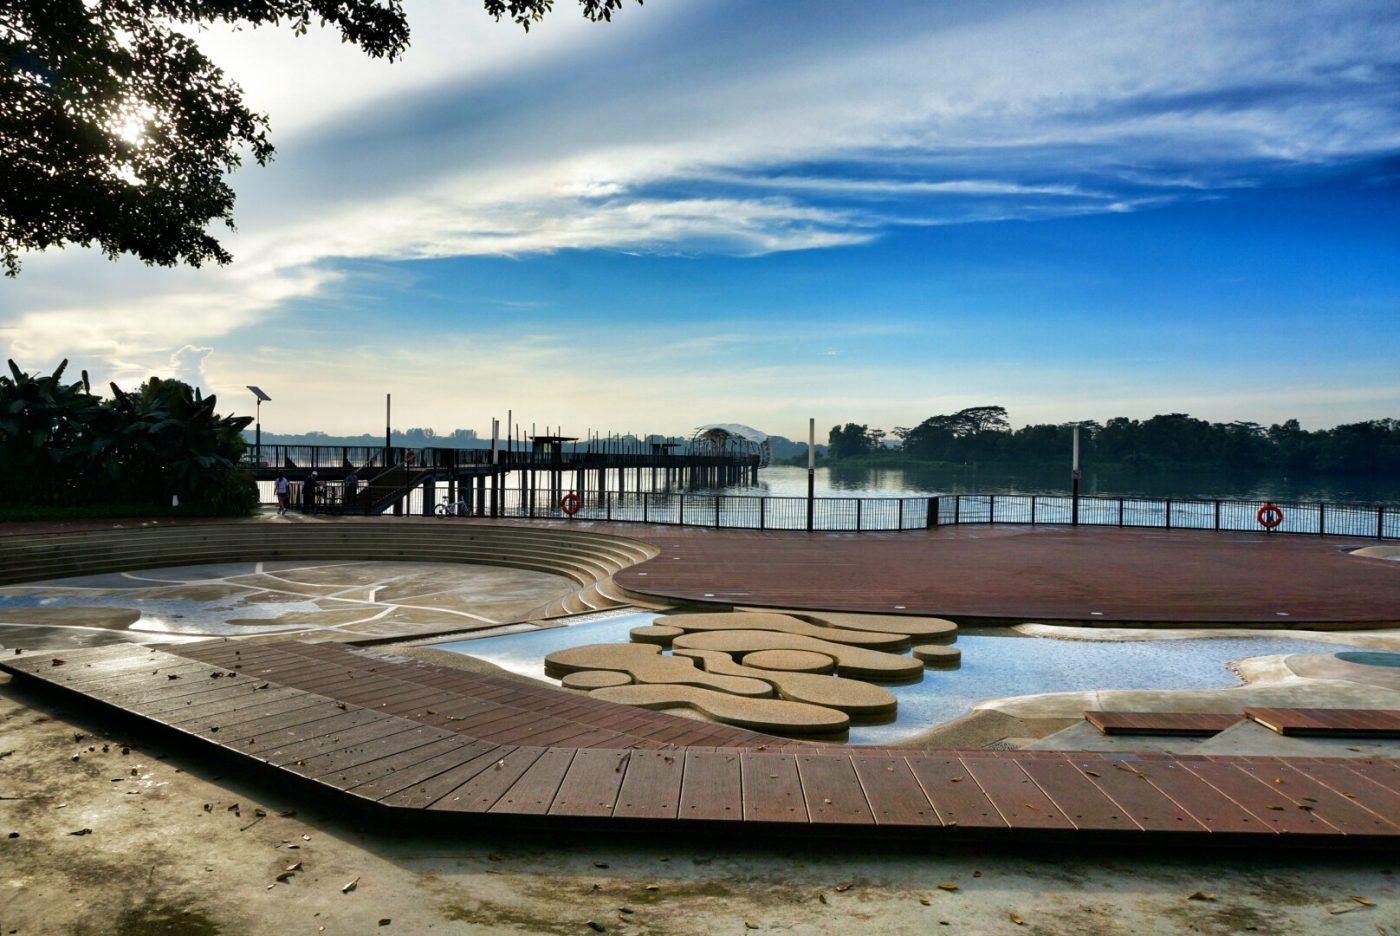 ریاچه ای لوور سلتار 1 1 - پارک دریاچه ای لوور سلتار سنگاپور